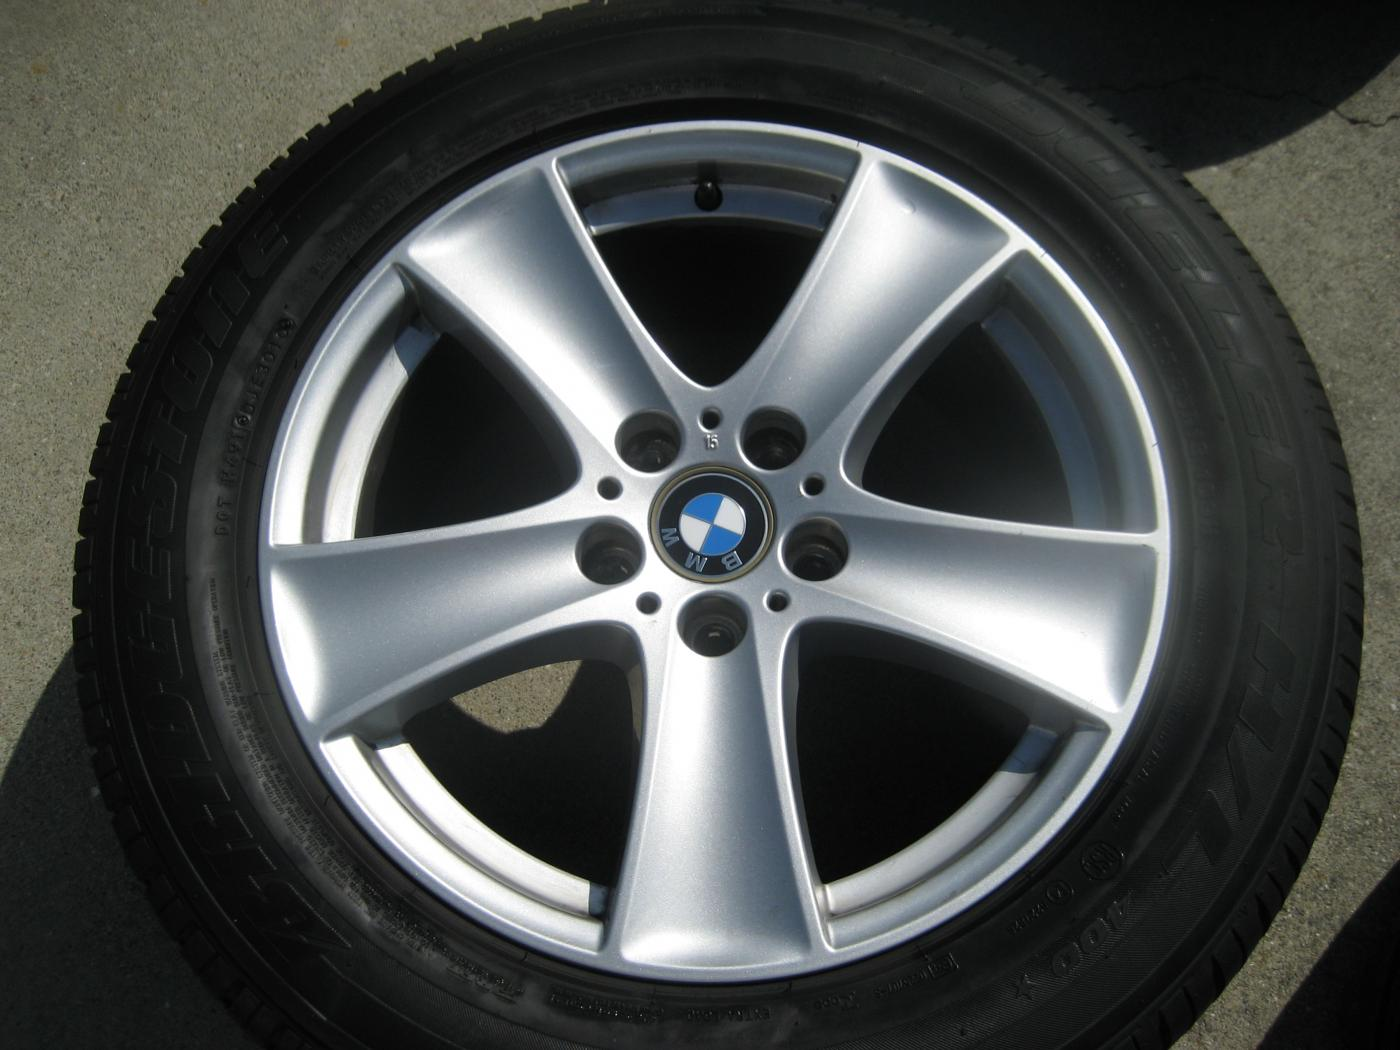 oem 18 bmw x5 wheels style 209 bridgestone run flat tires. Black Bedroom Furniture Sets. Home Design Ideas